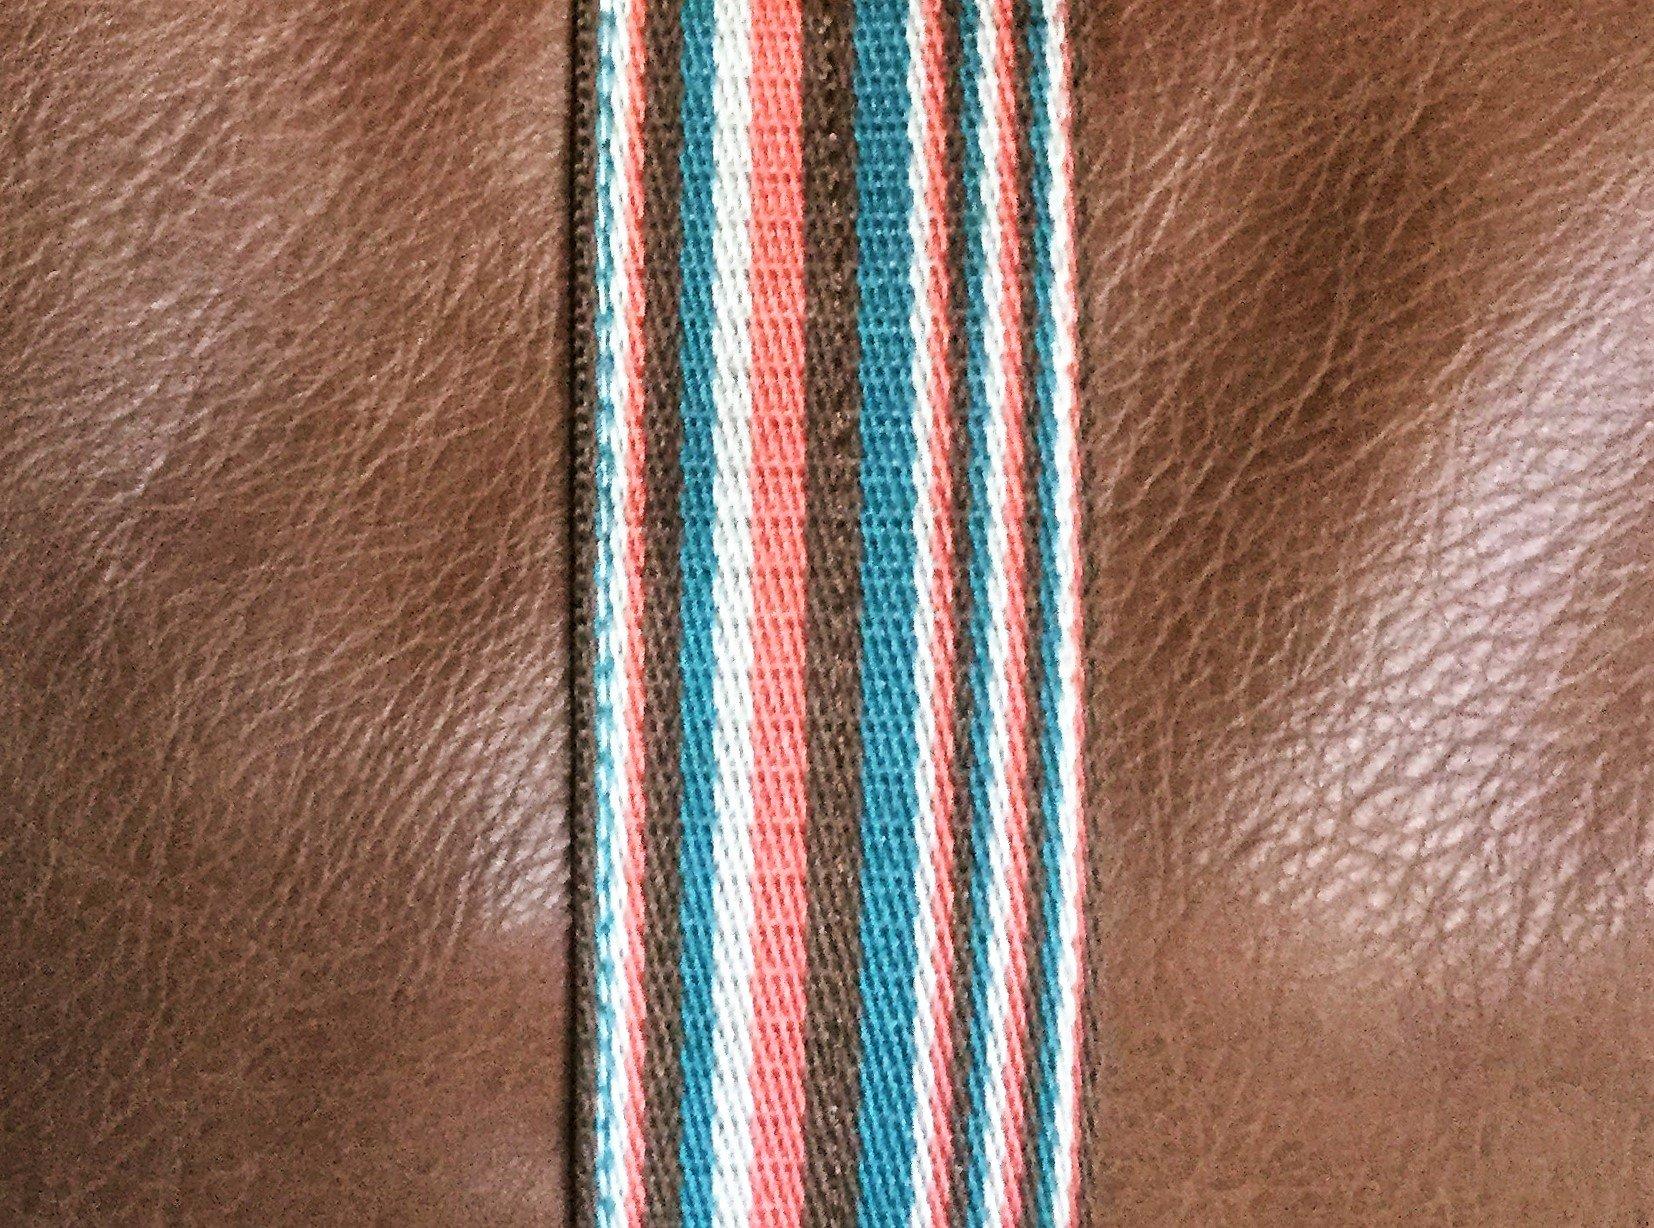 Bungalow 360 Original Vegan Leather Striped Hobo Bag (Nutmeg) by bungalow 360 (Image #2)